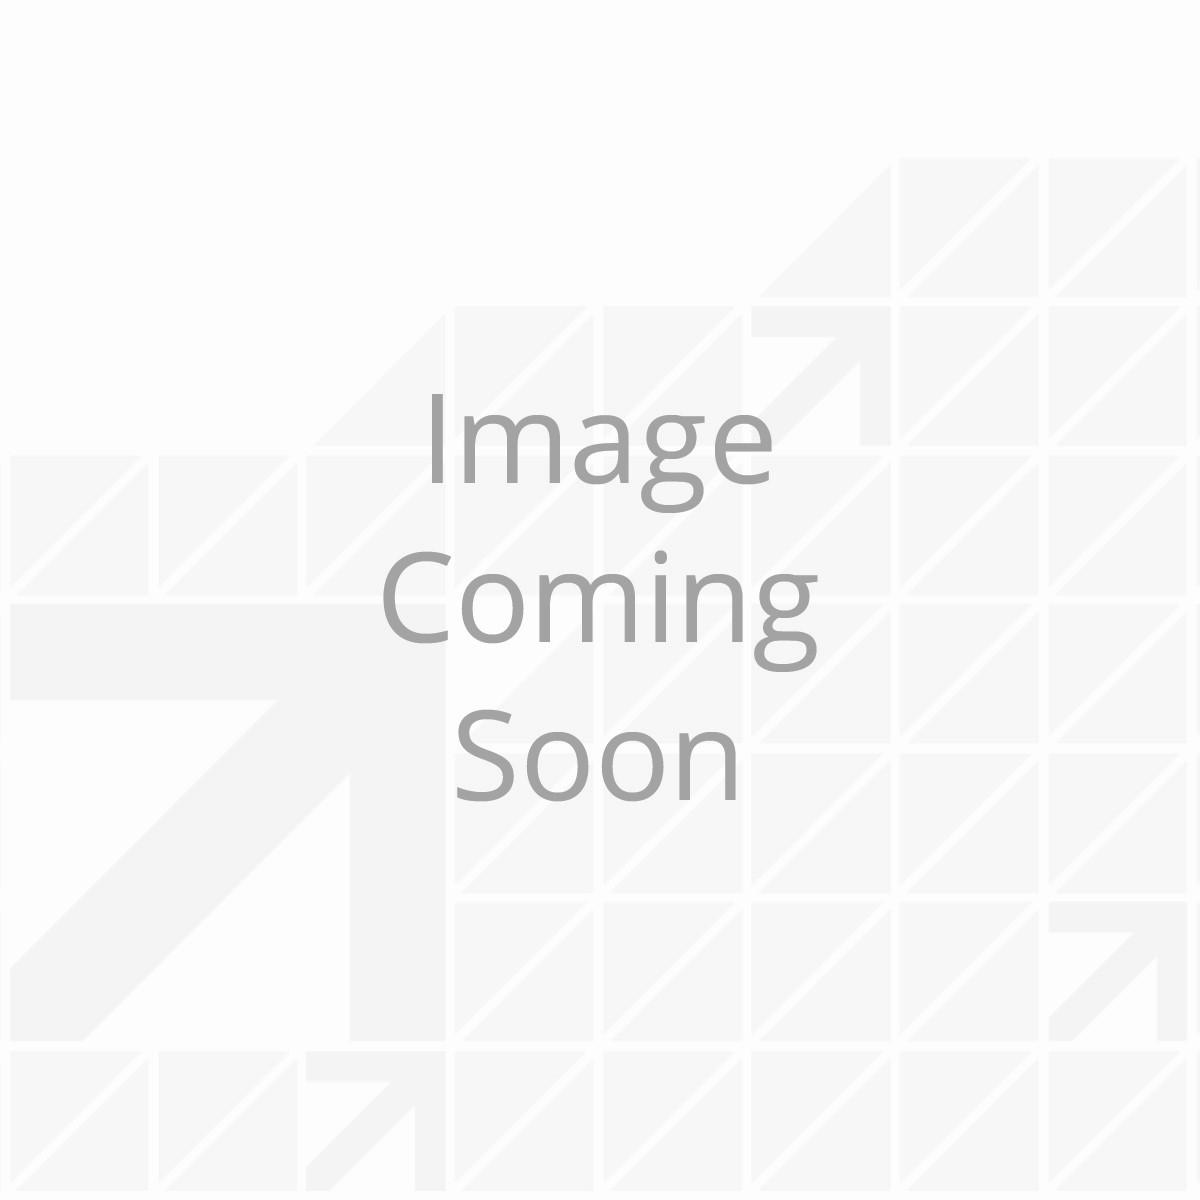 "MV Round Bar Weight Distribution Hitch (6K - 8K lbs., 31-3/16"" Bars)"